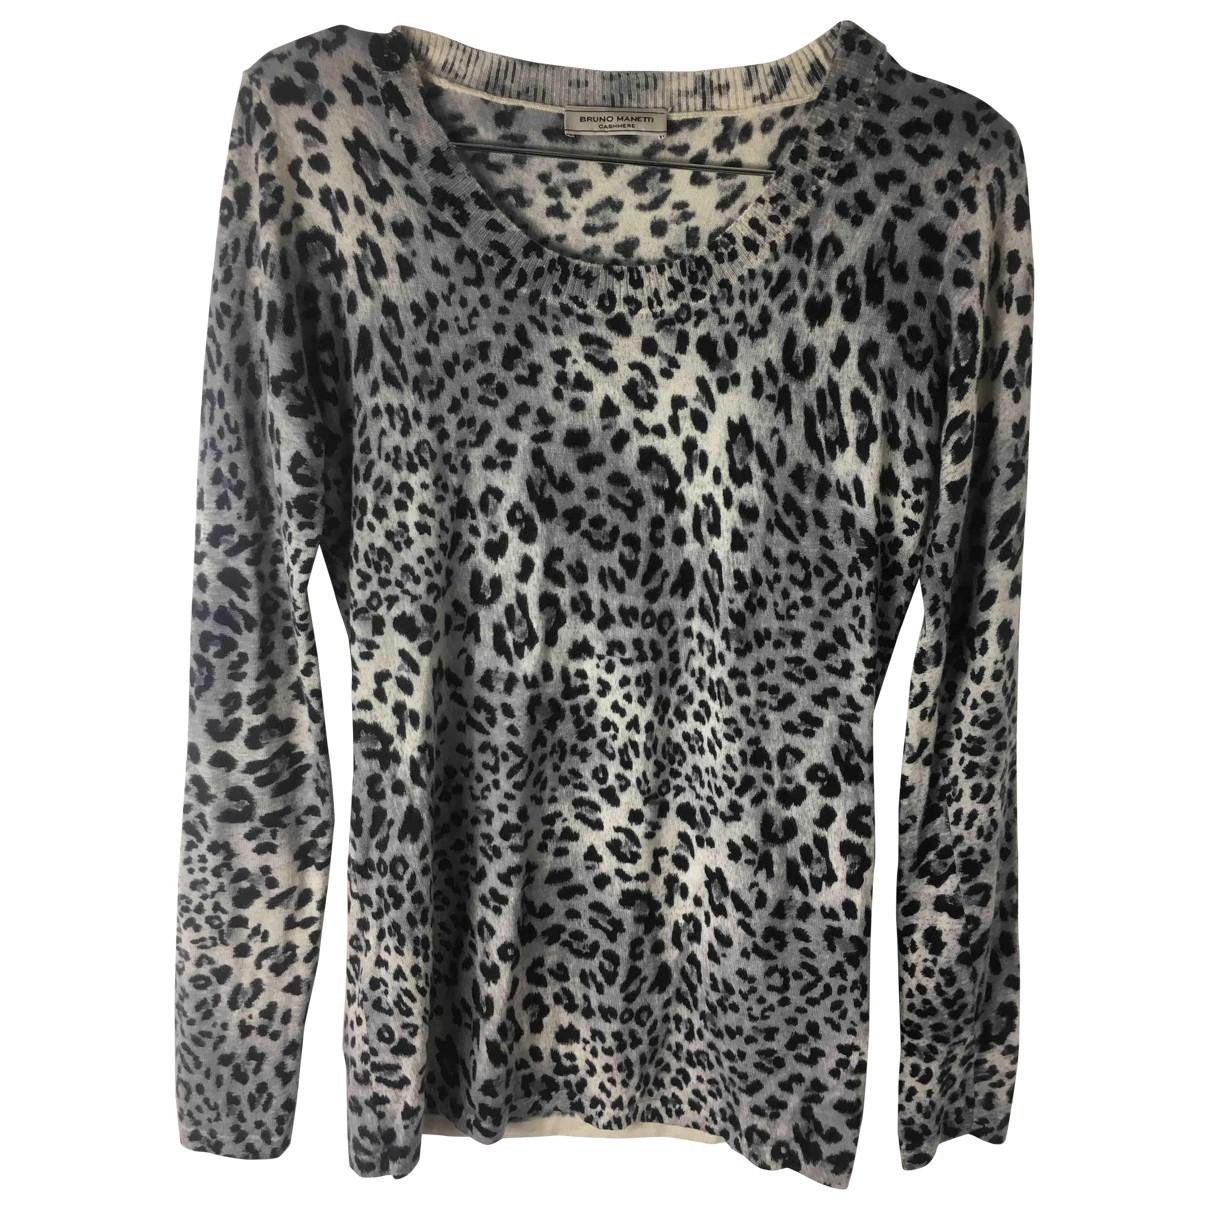 Bruno Manetti \N Grey Cashmere Knitwear for Women S International